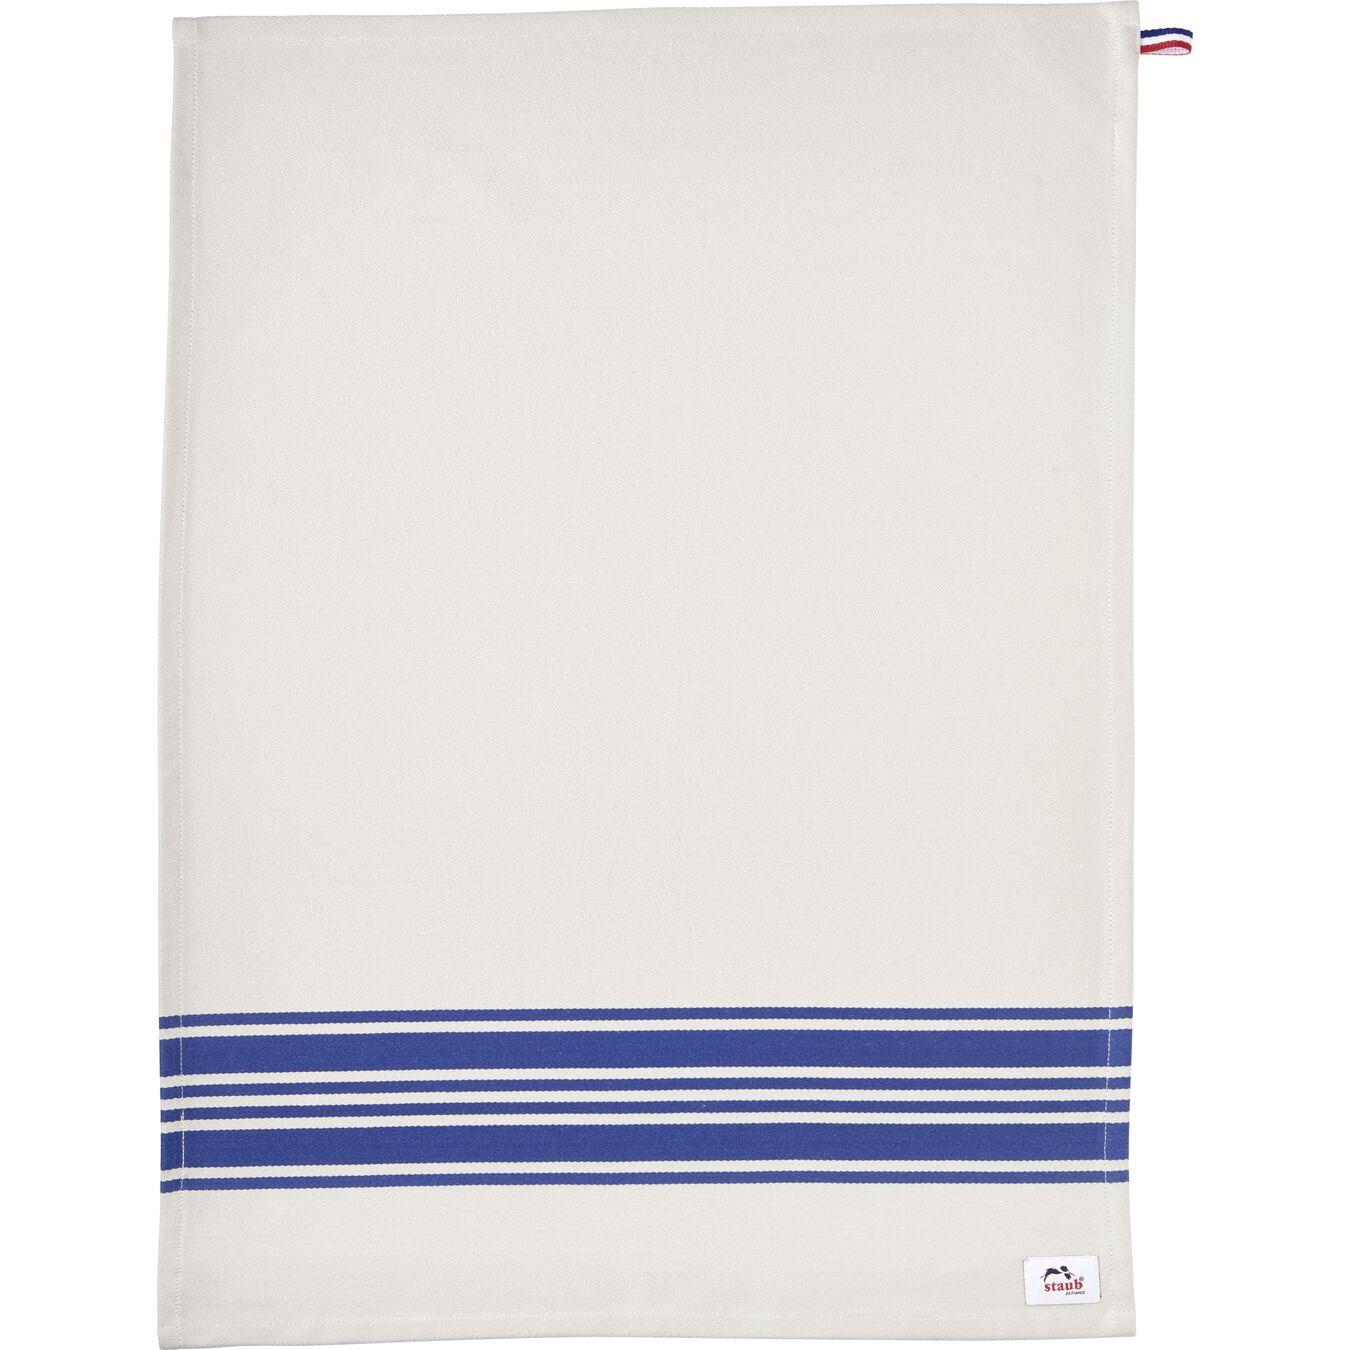 Torchon, Bleu,,large 6